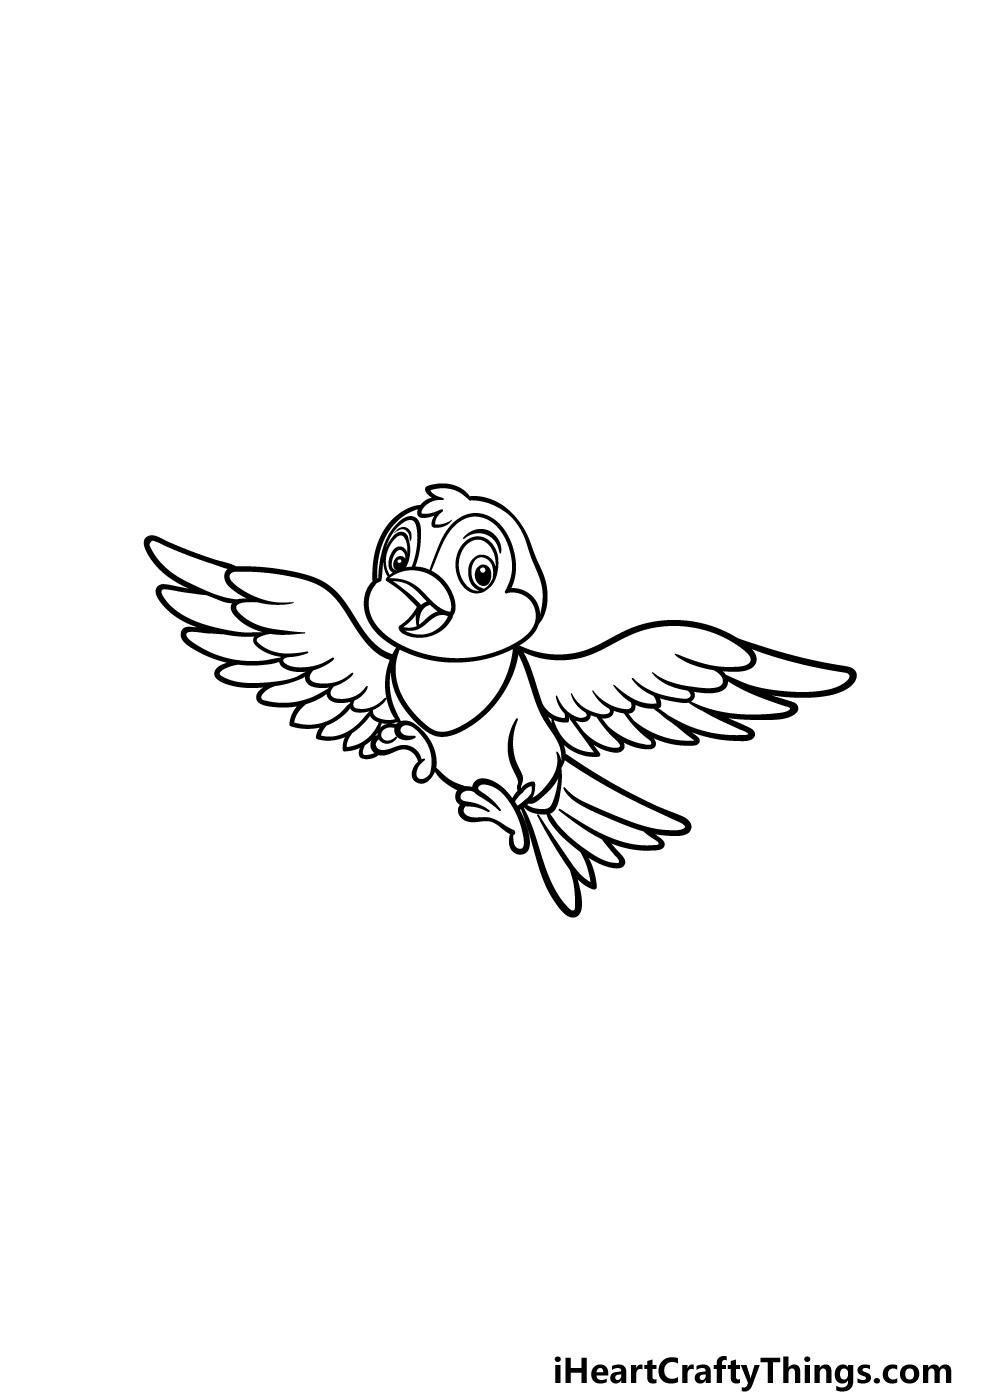 how to draw a cartoon bird step 5